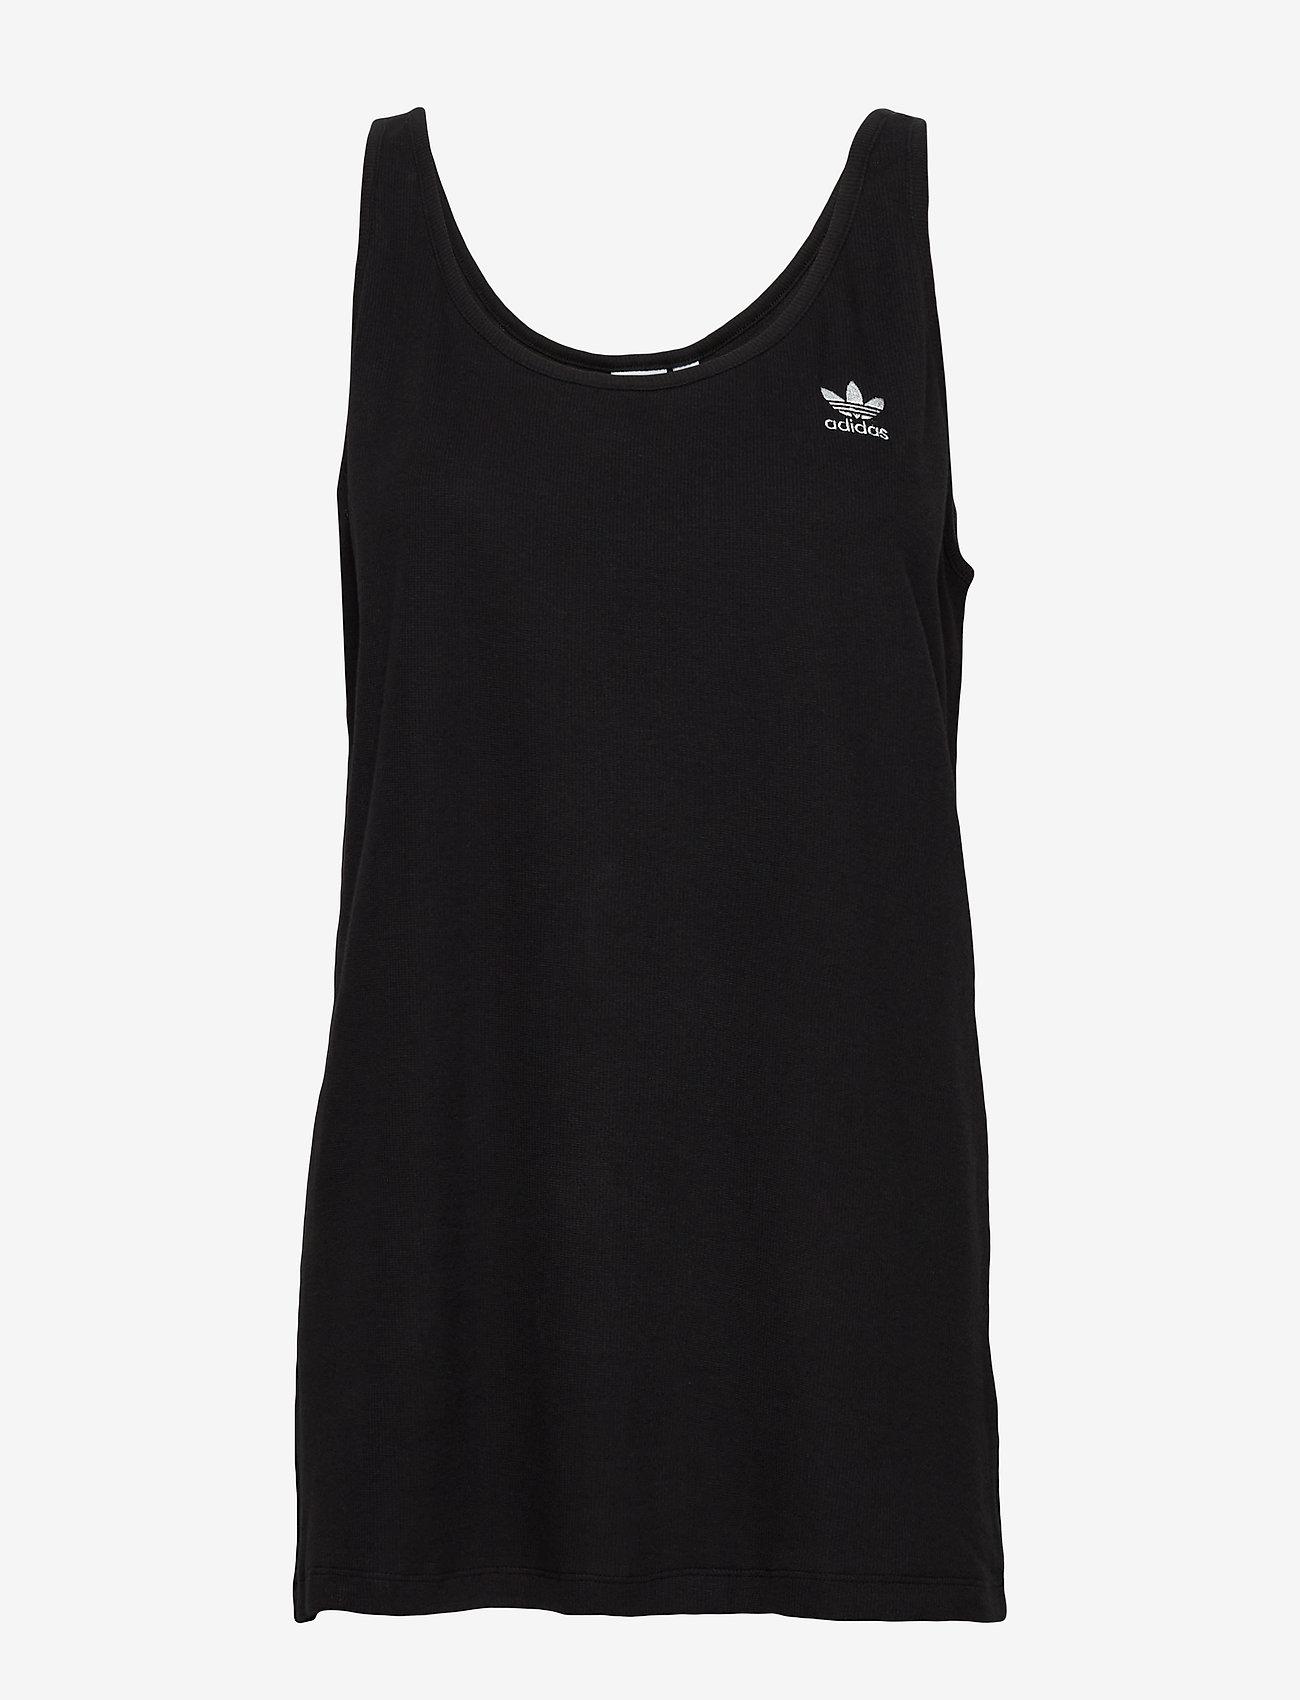 adidas Originals - TANK TOP - sportstopper - black/white - 1